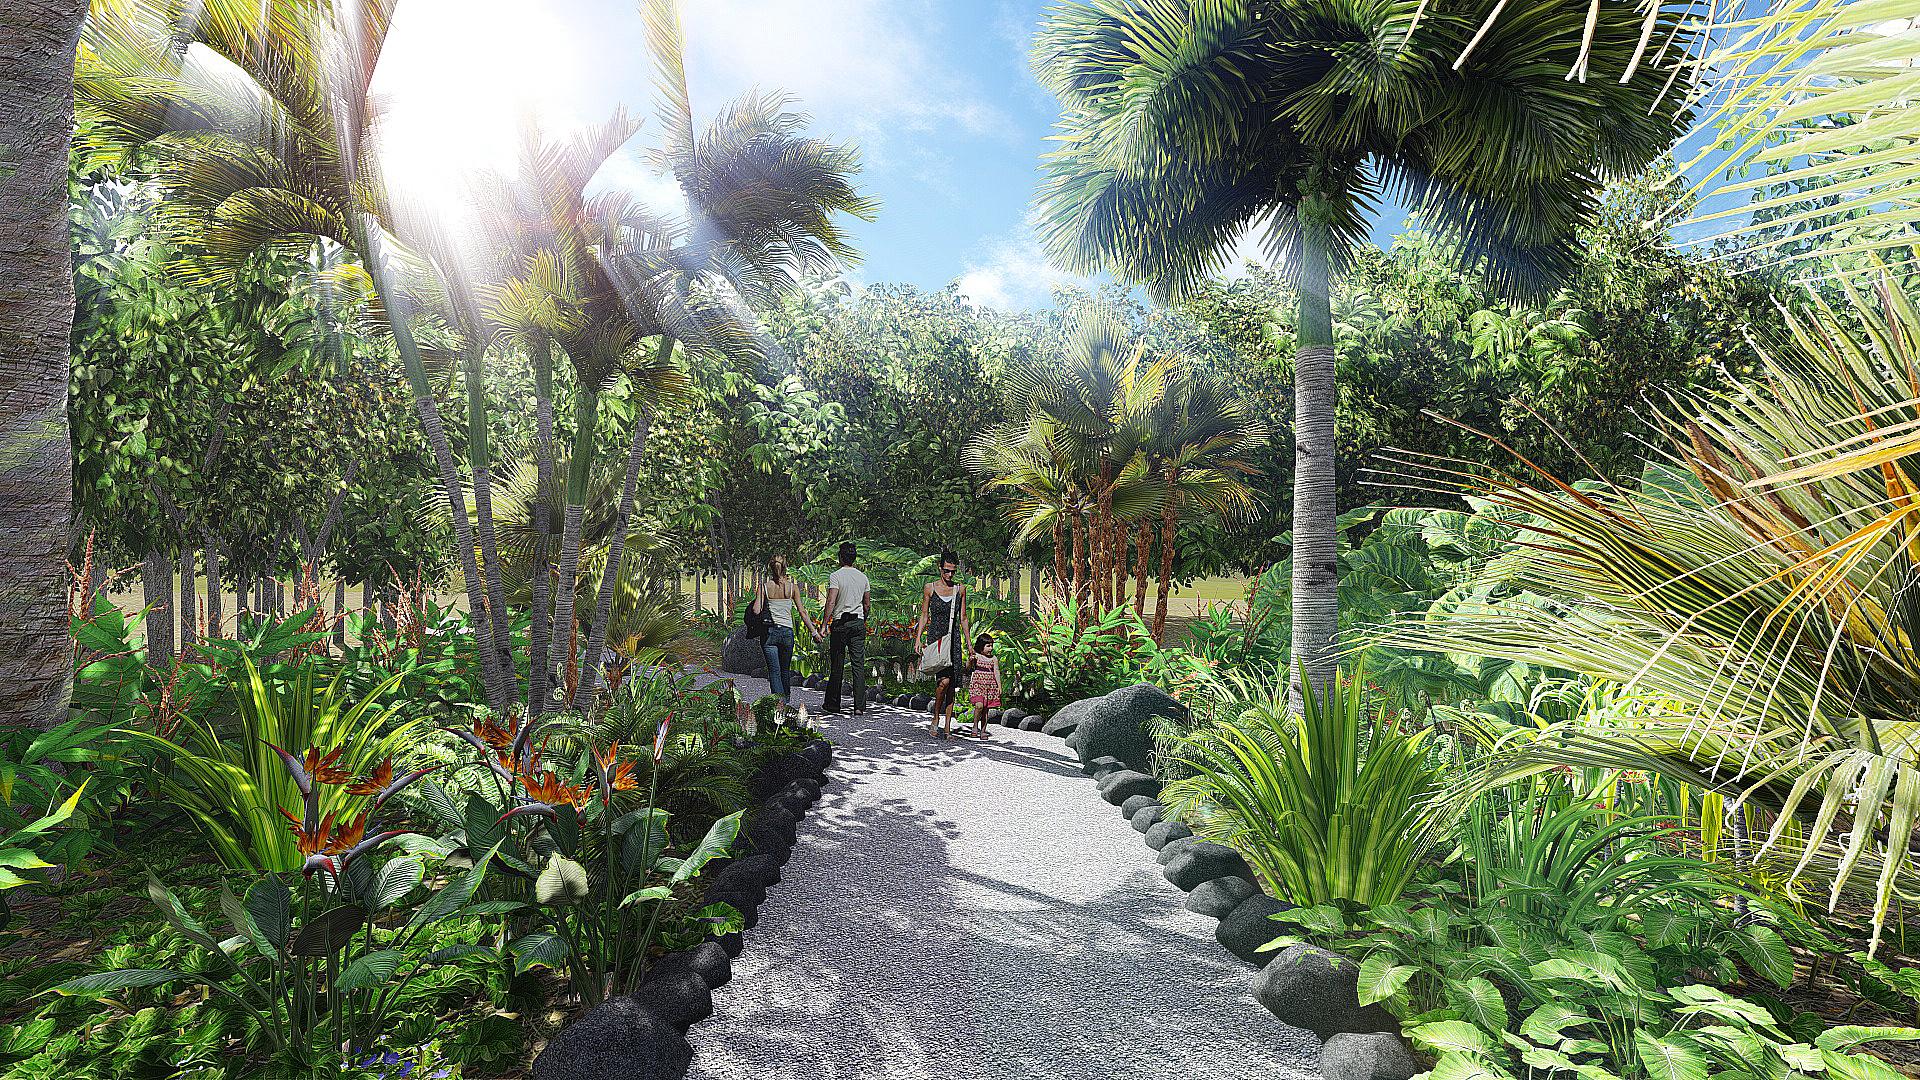 Jardin botanique Faaroa